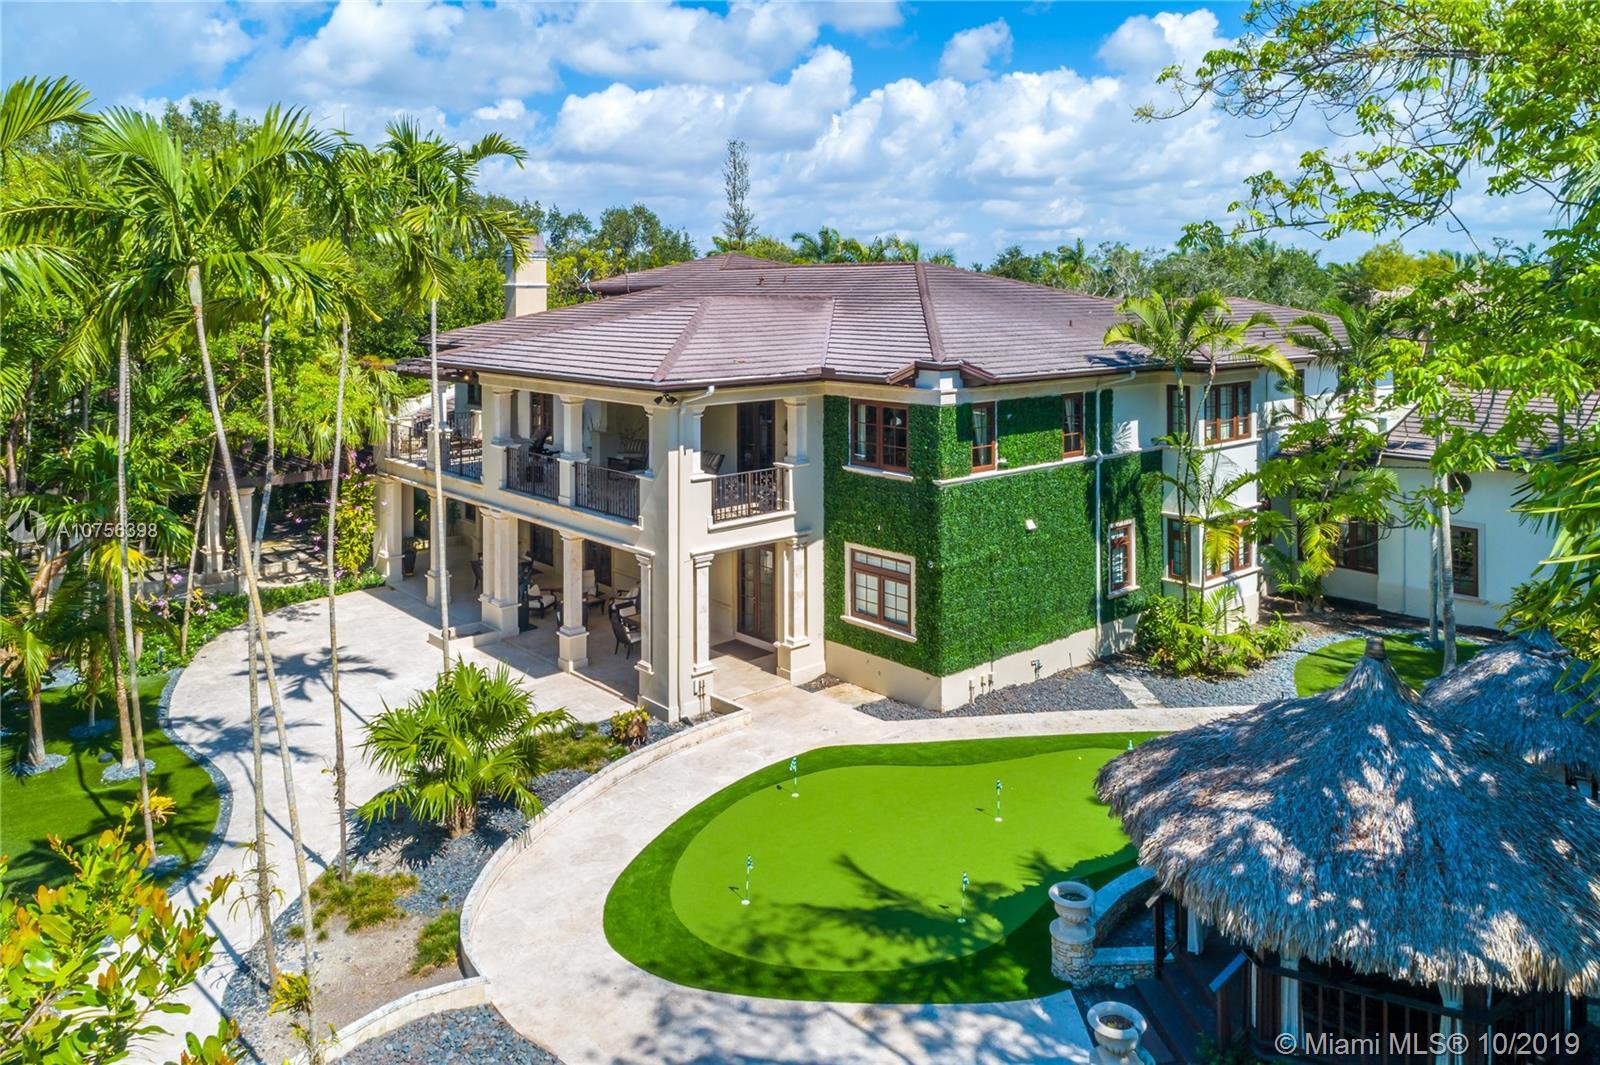 4800 Pine Dr, Coral Gables, Florida